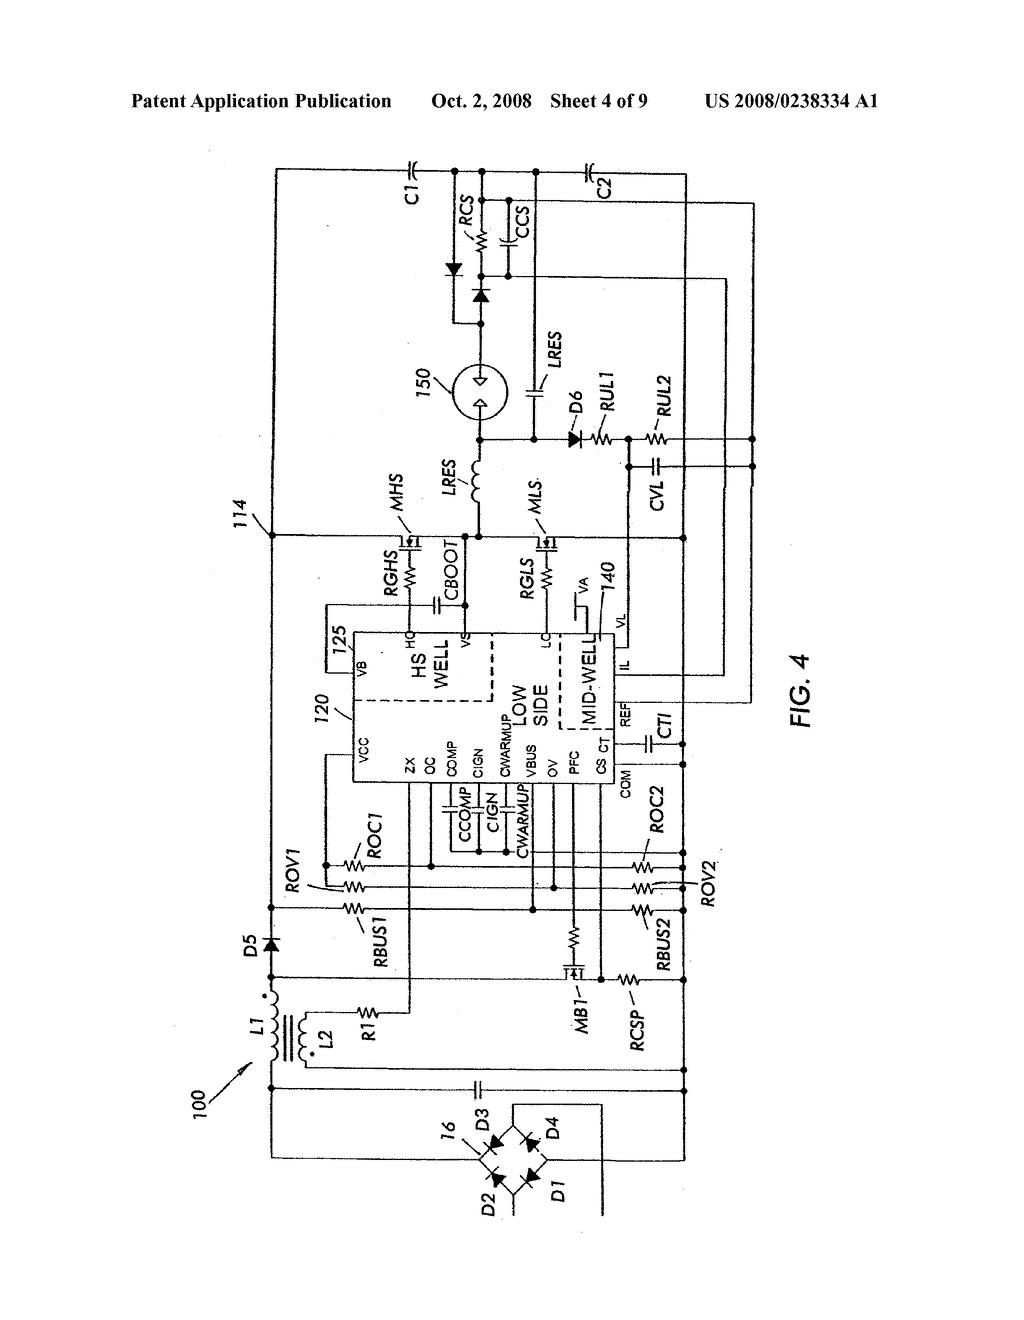 fulham workhorse wh5 120 l wiring diagram wiring diagram Fulham Wh5 120 L Wiring Diagram workhorse 2 ballast wiring diagram t5 electronic fulham wh5 120 l wiring diagram